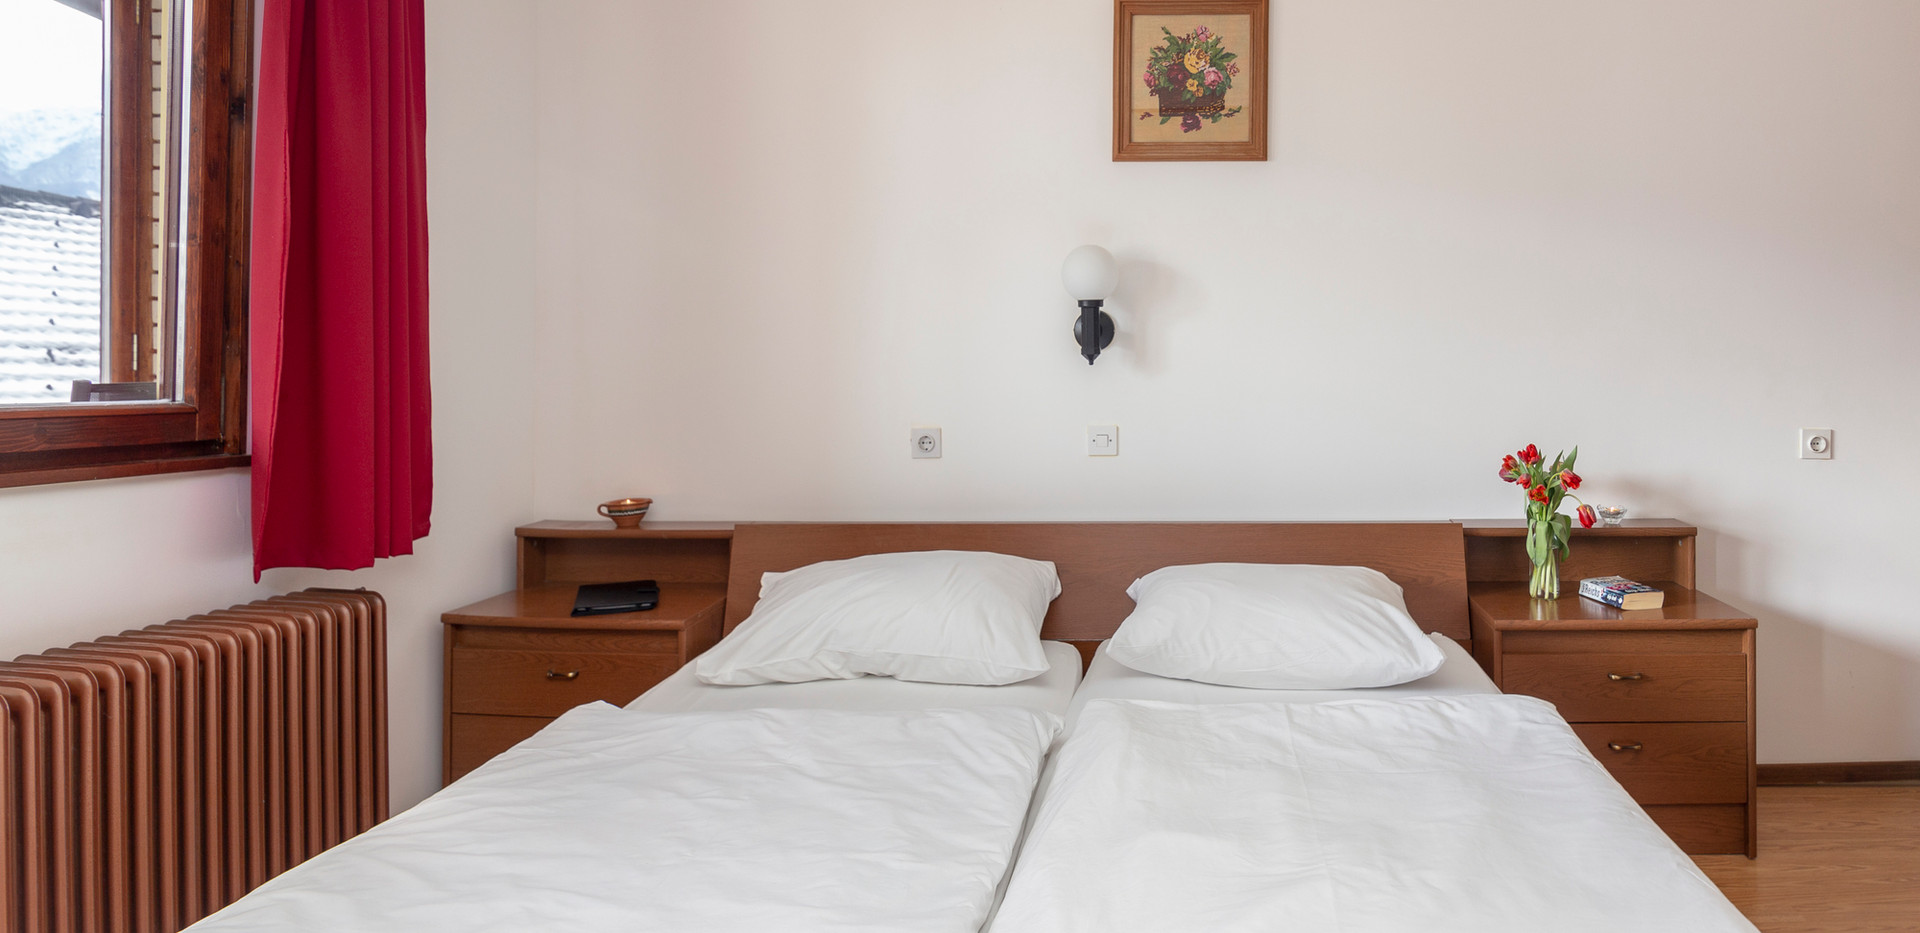 bedroom_1630.jpg